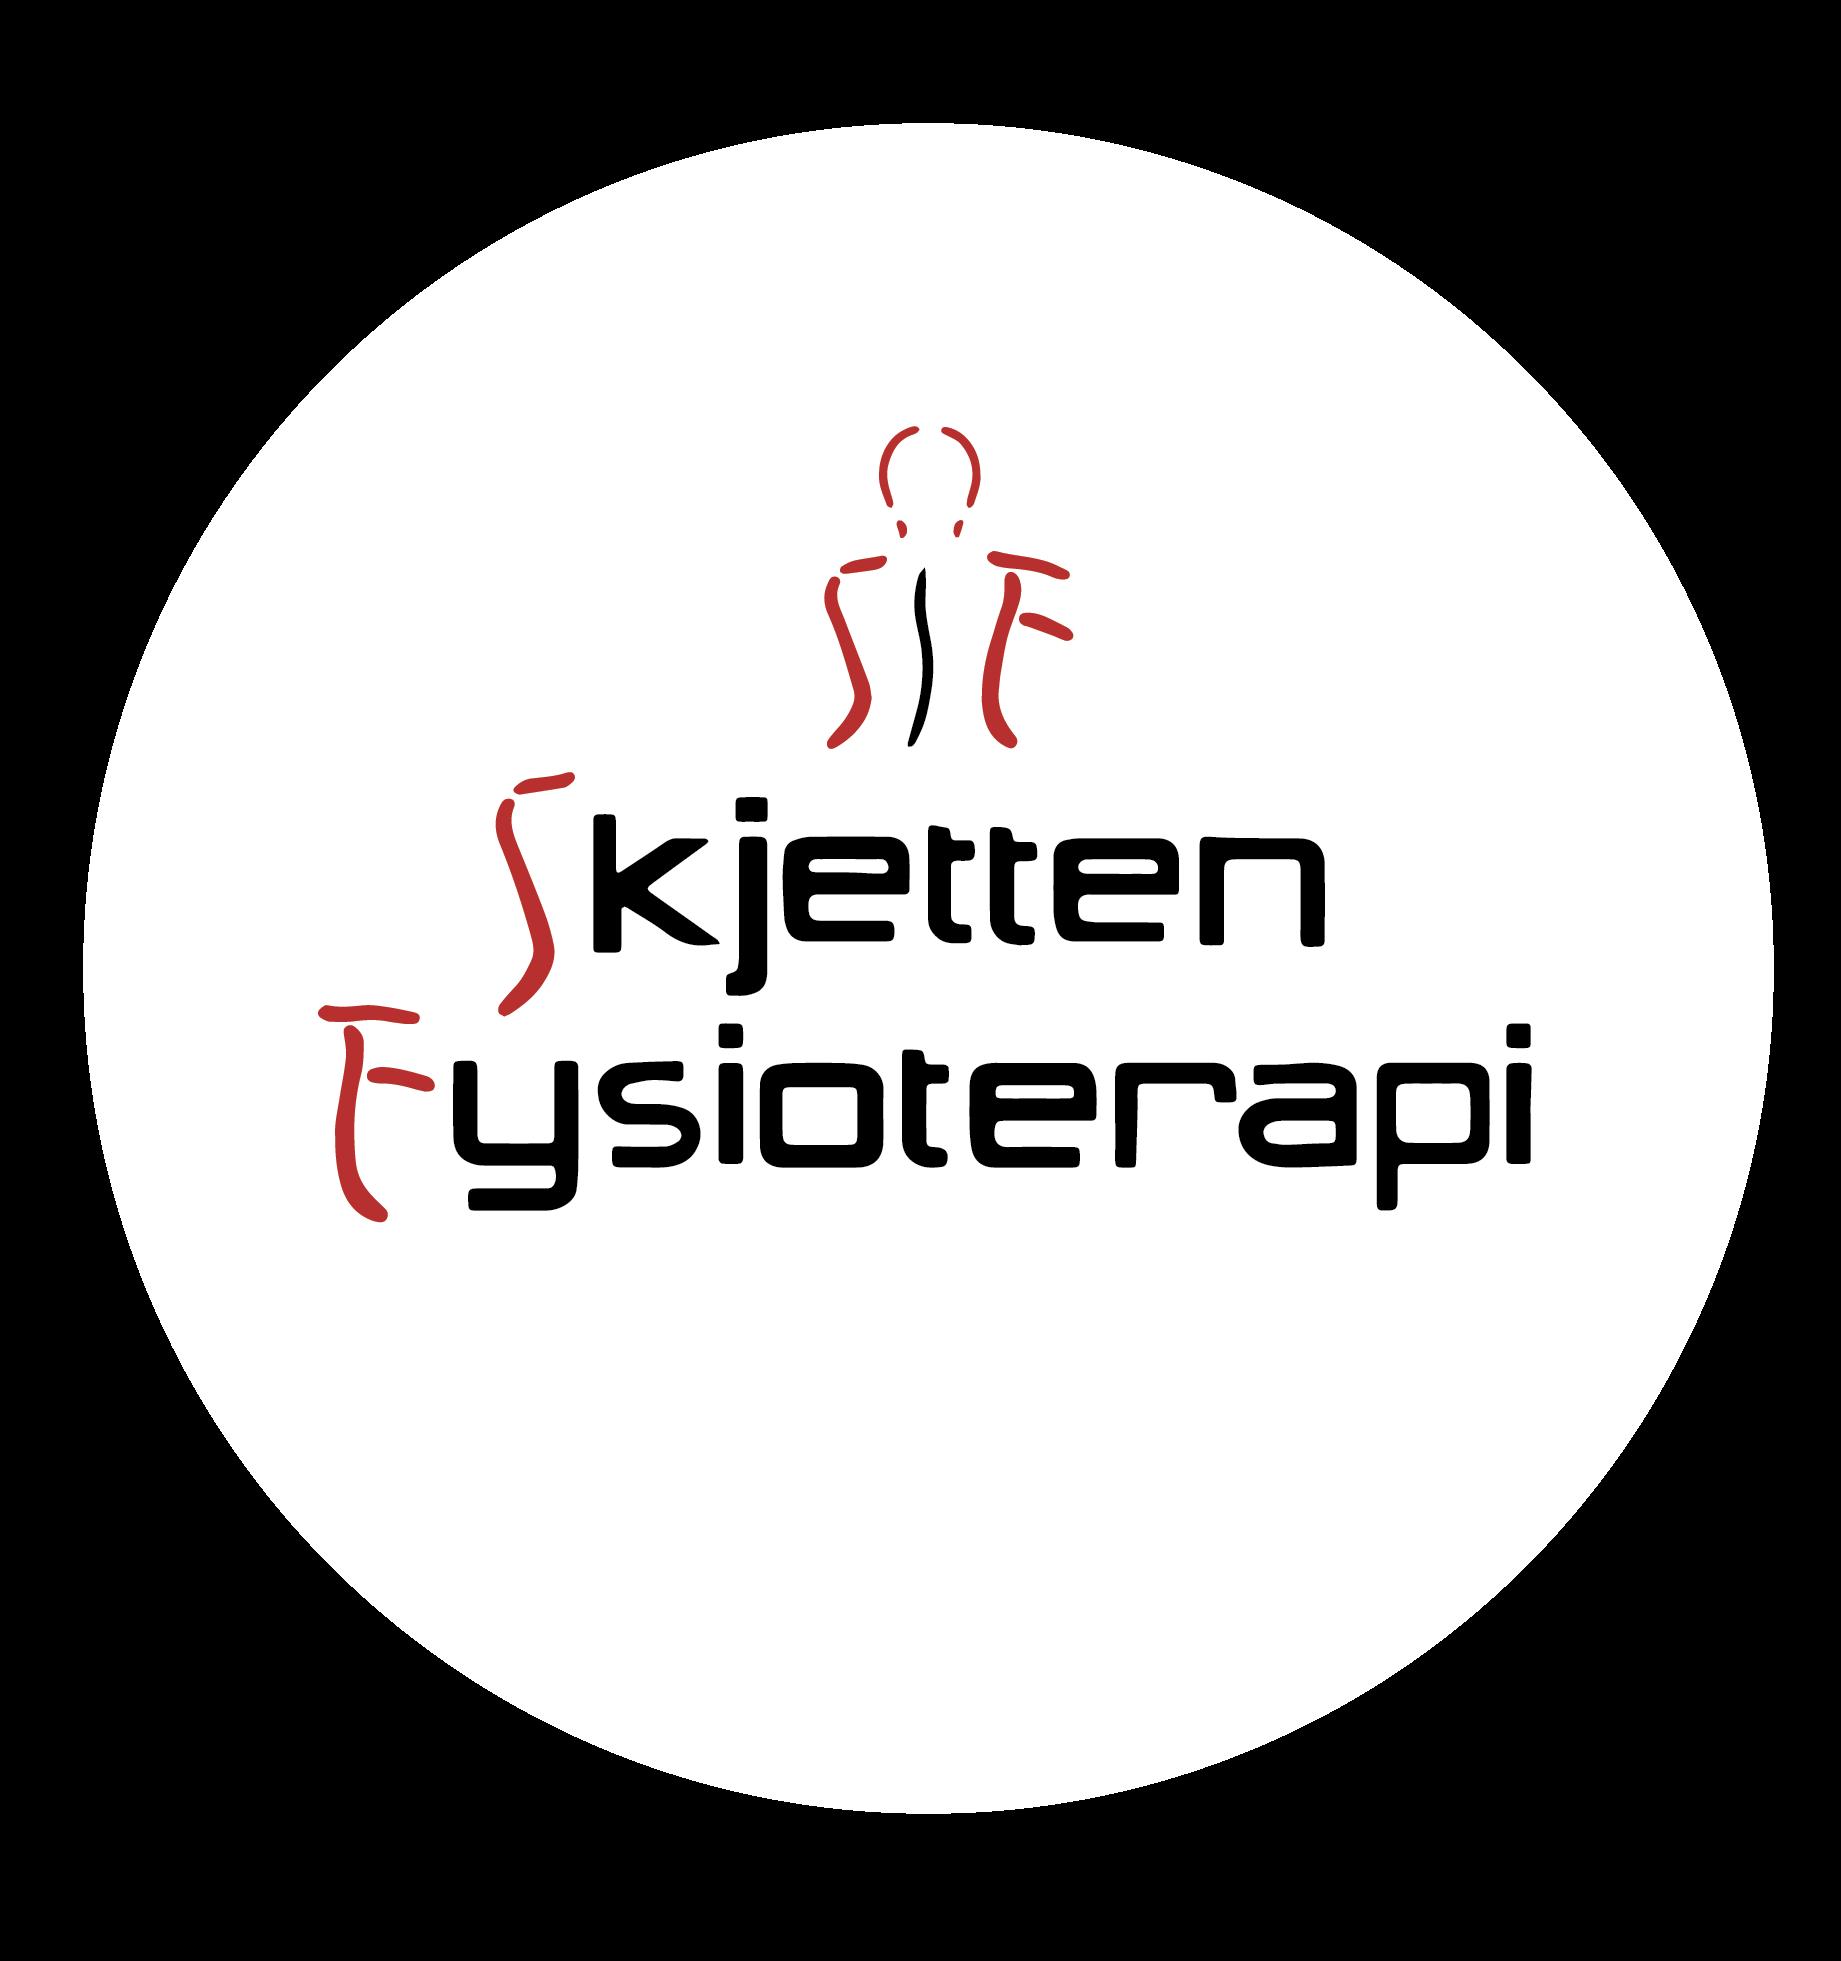 Skjetten Fysioterapi